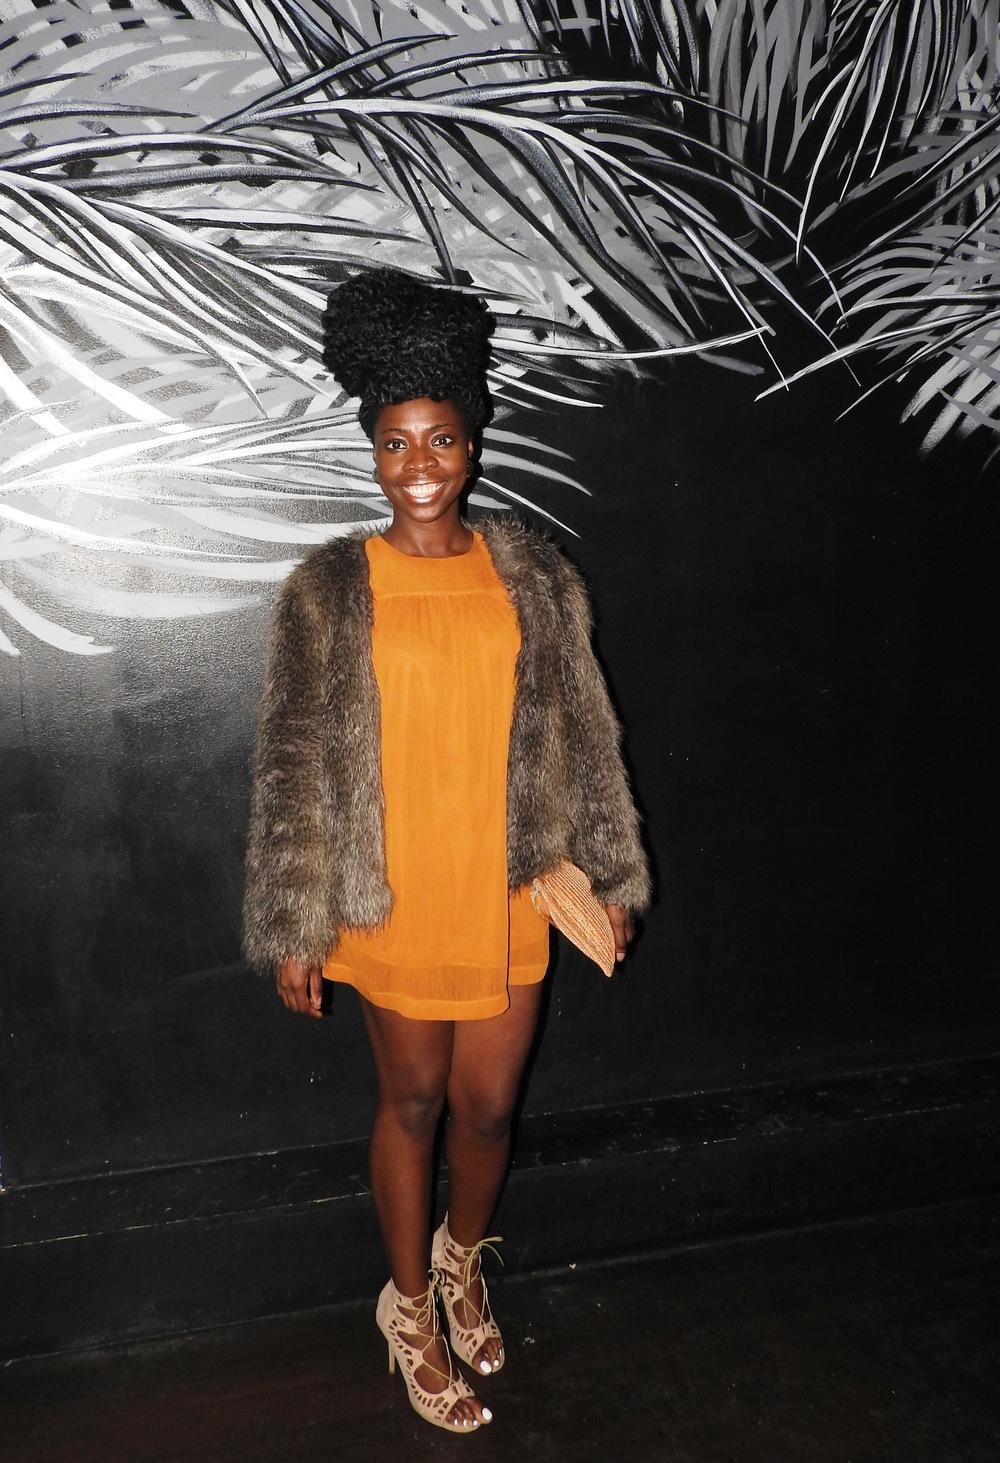 Kreyol/D.Irvin - Harlem Nights @ Savvor